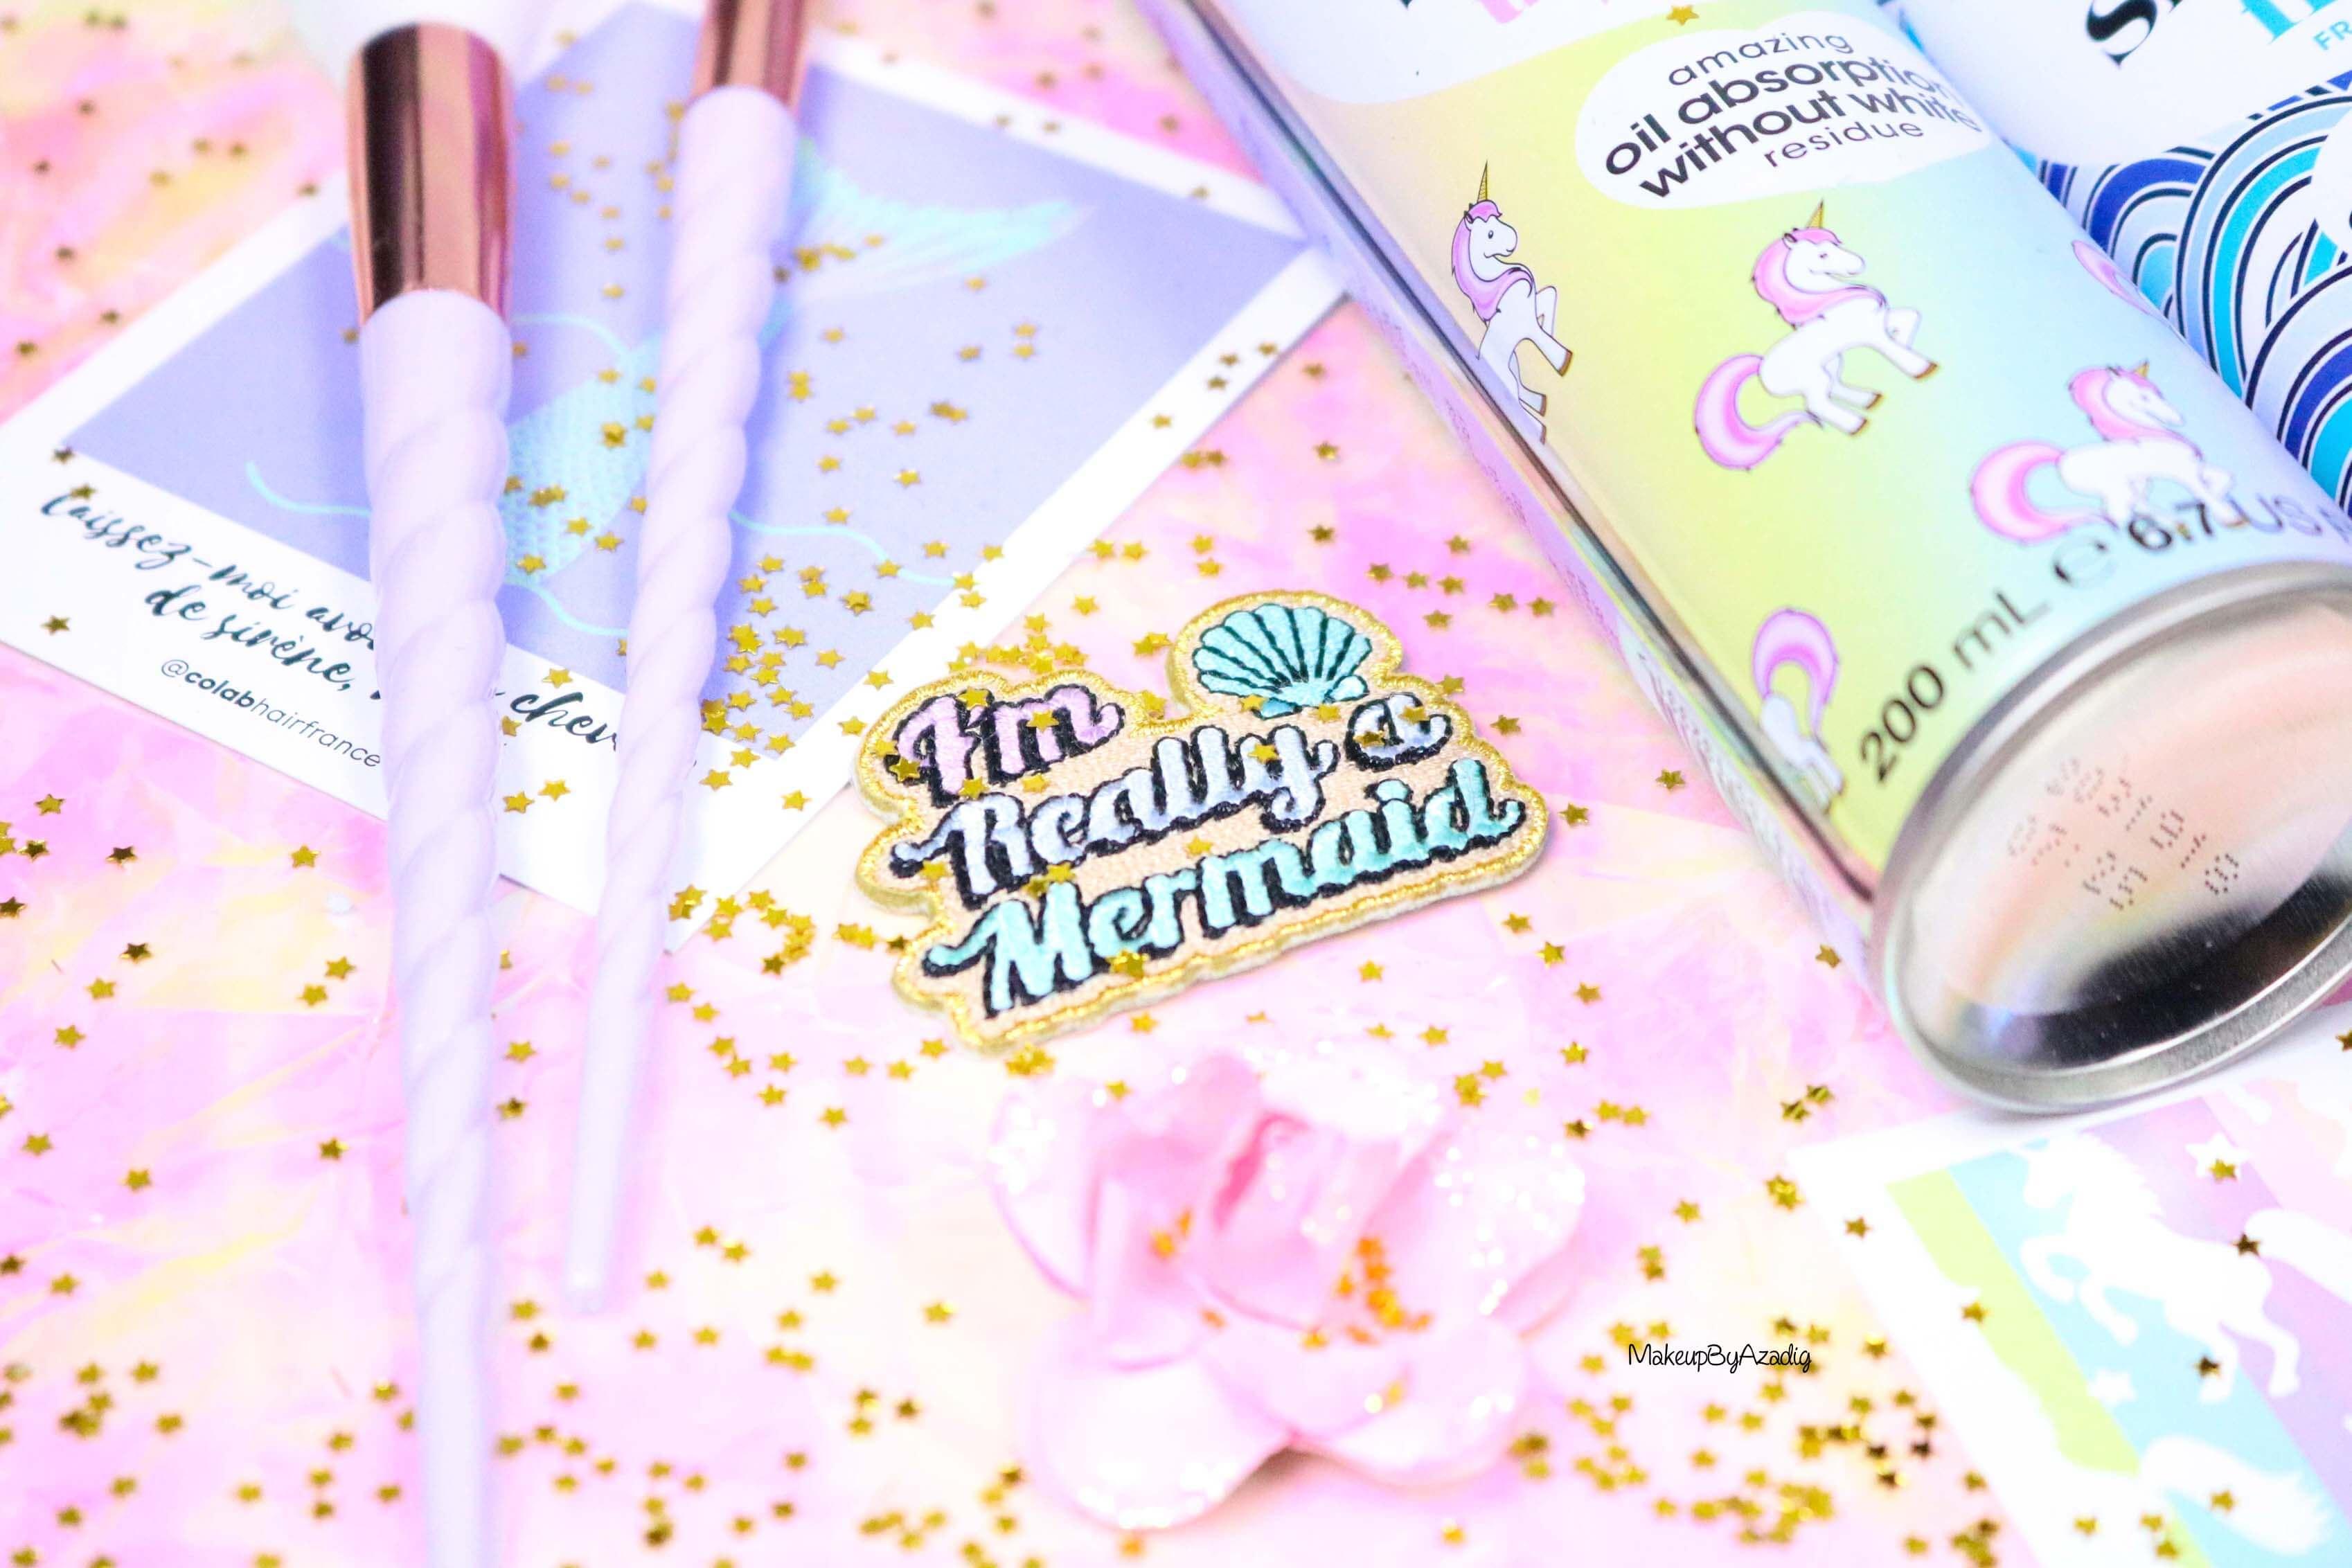 revue-shampooing-sec-colab-batiste-fresh-unicorn-monoprix-feelunique-prix-avis--soin-capillaire-efficacite-makeupbyazadig-mermaid